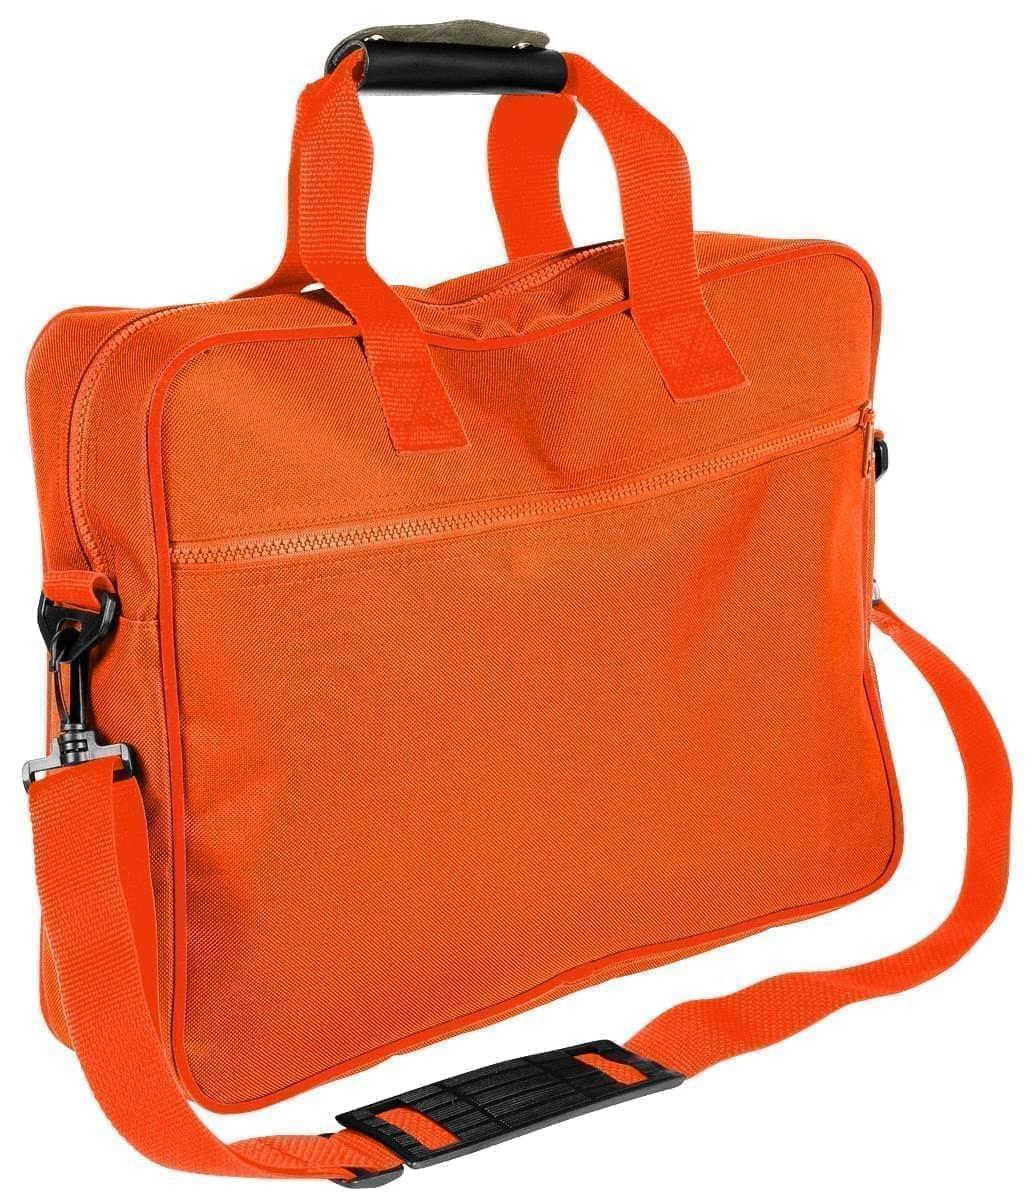 USA Made Nylon Poly Notebook Sleeves, Orange-Orange, CPKVA59PX0